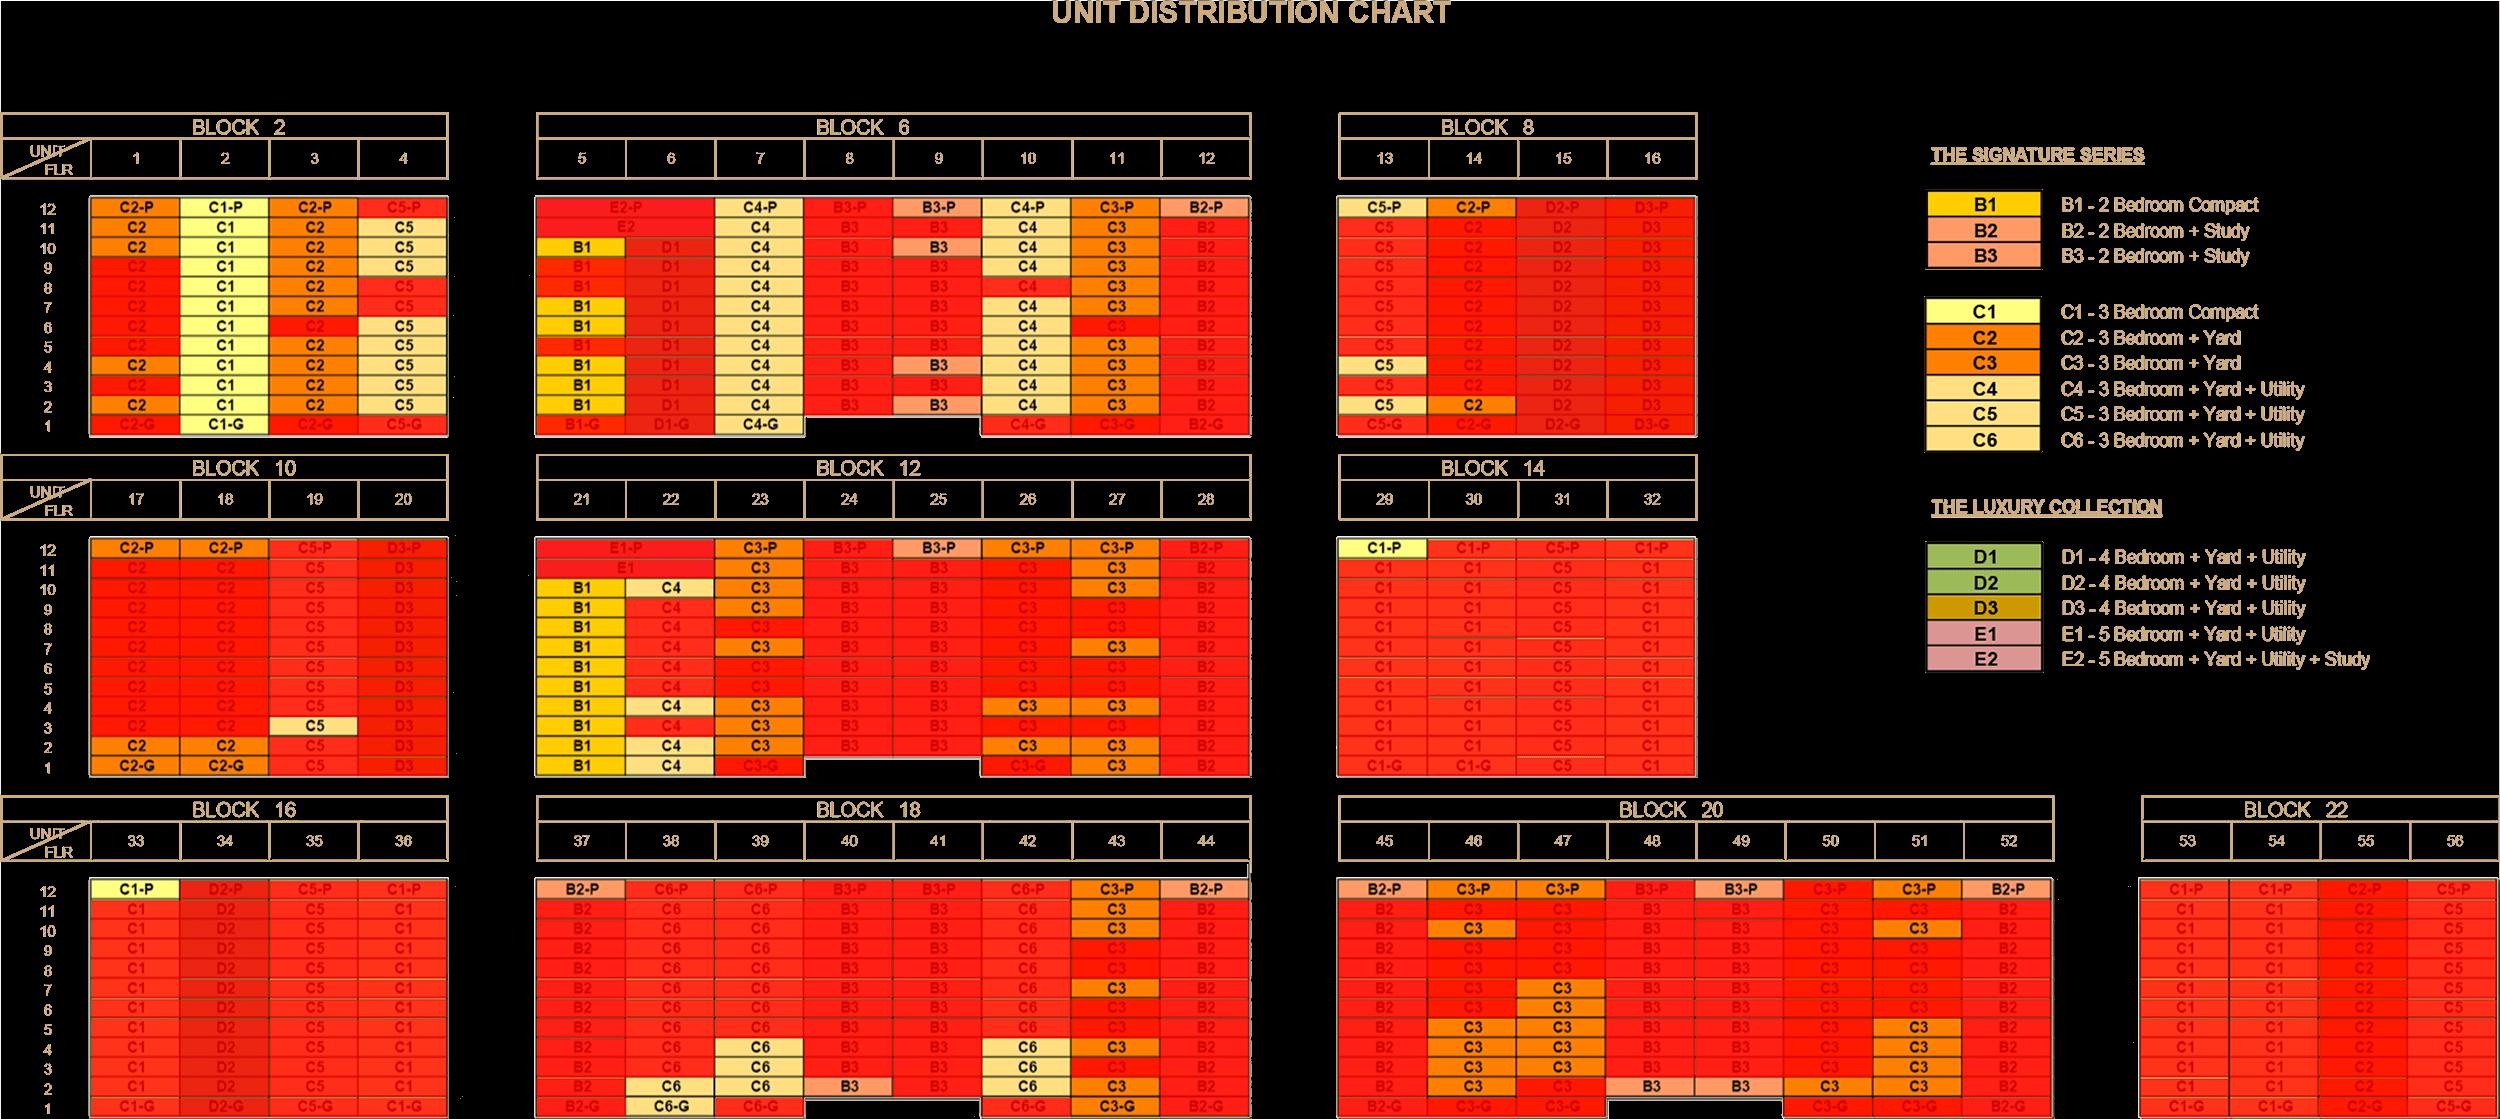 Ki Residences Elevation Chart 11102021